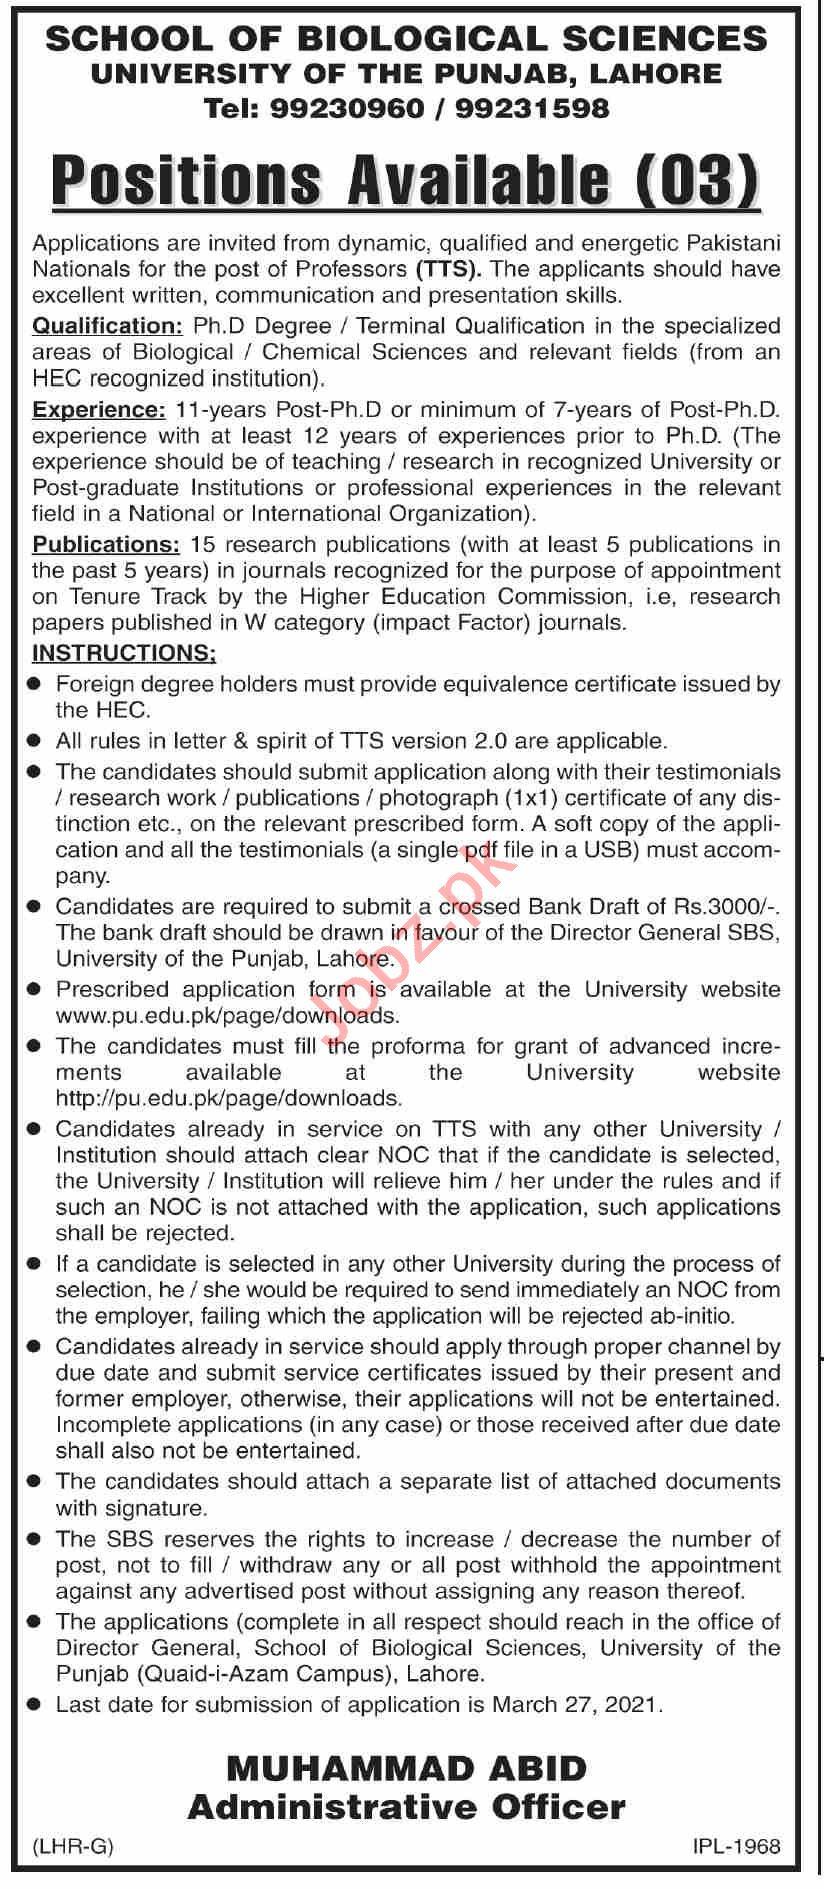 School of Biological Sciences University of Punjab PU Jobs